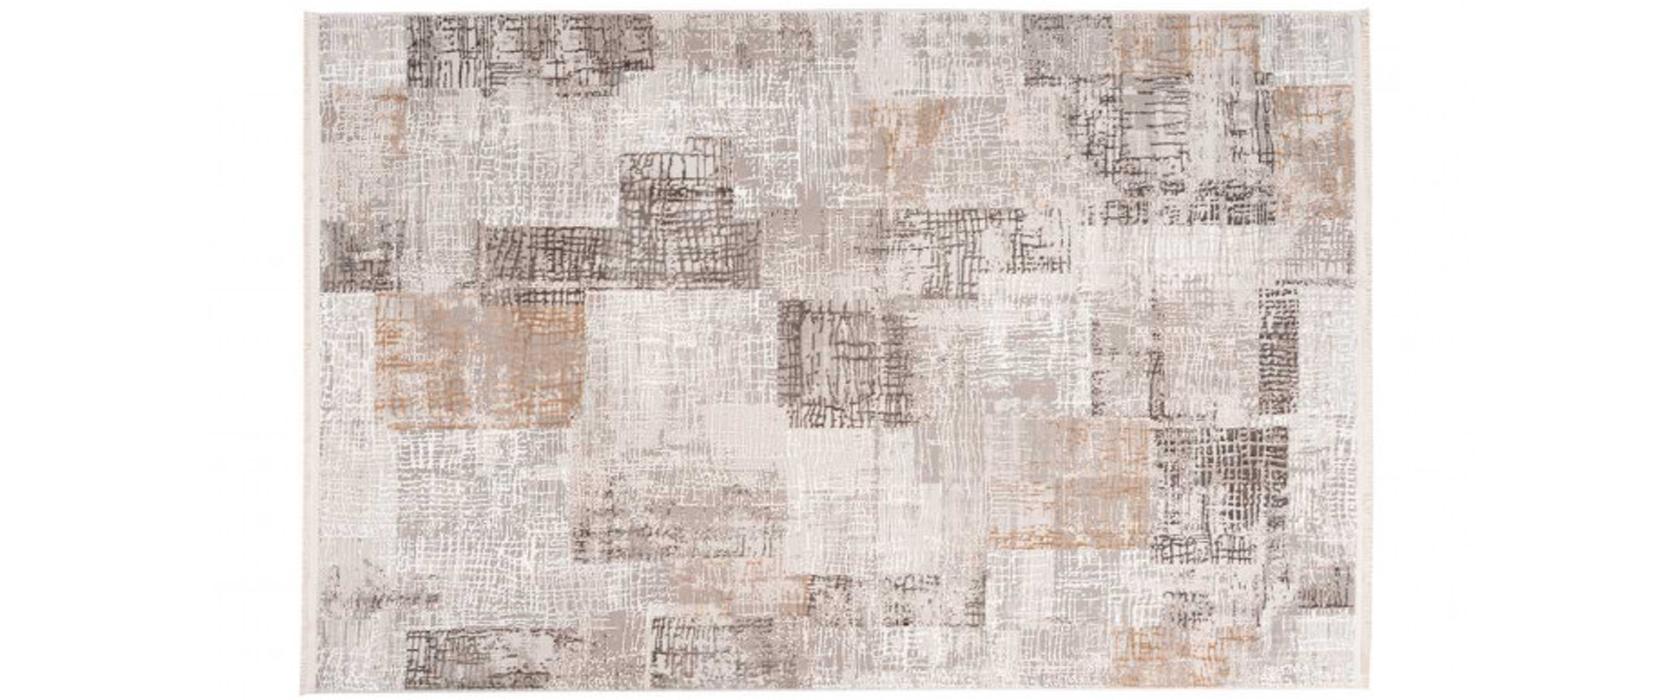 Ковер Akropolis 425 Grey/Silver 160х230 см - Pufetto